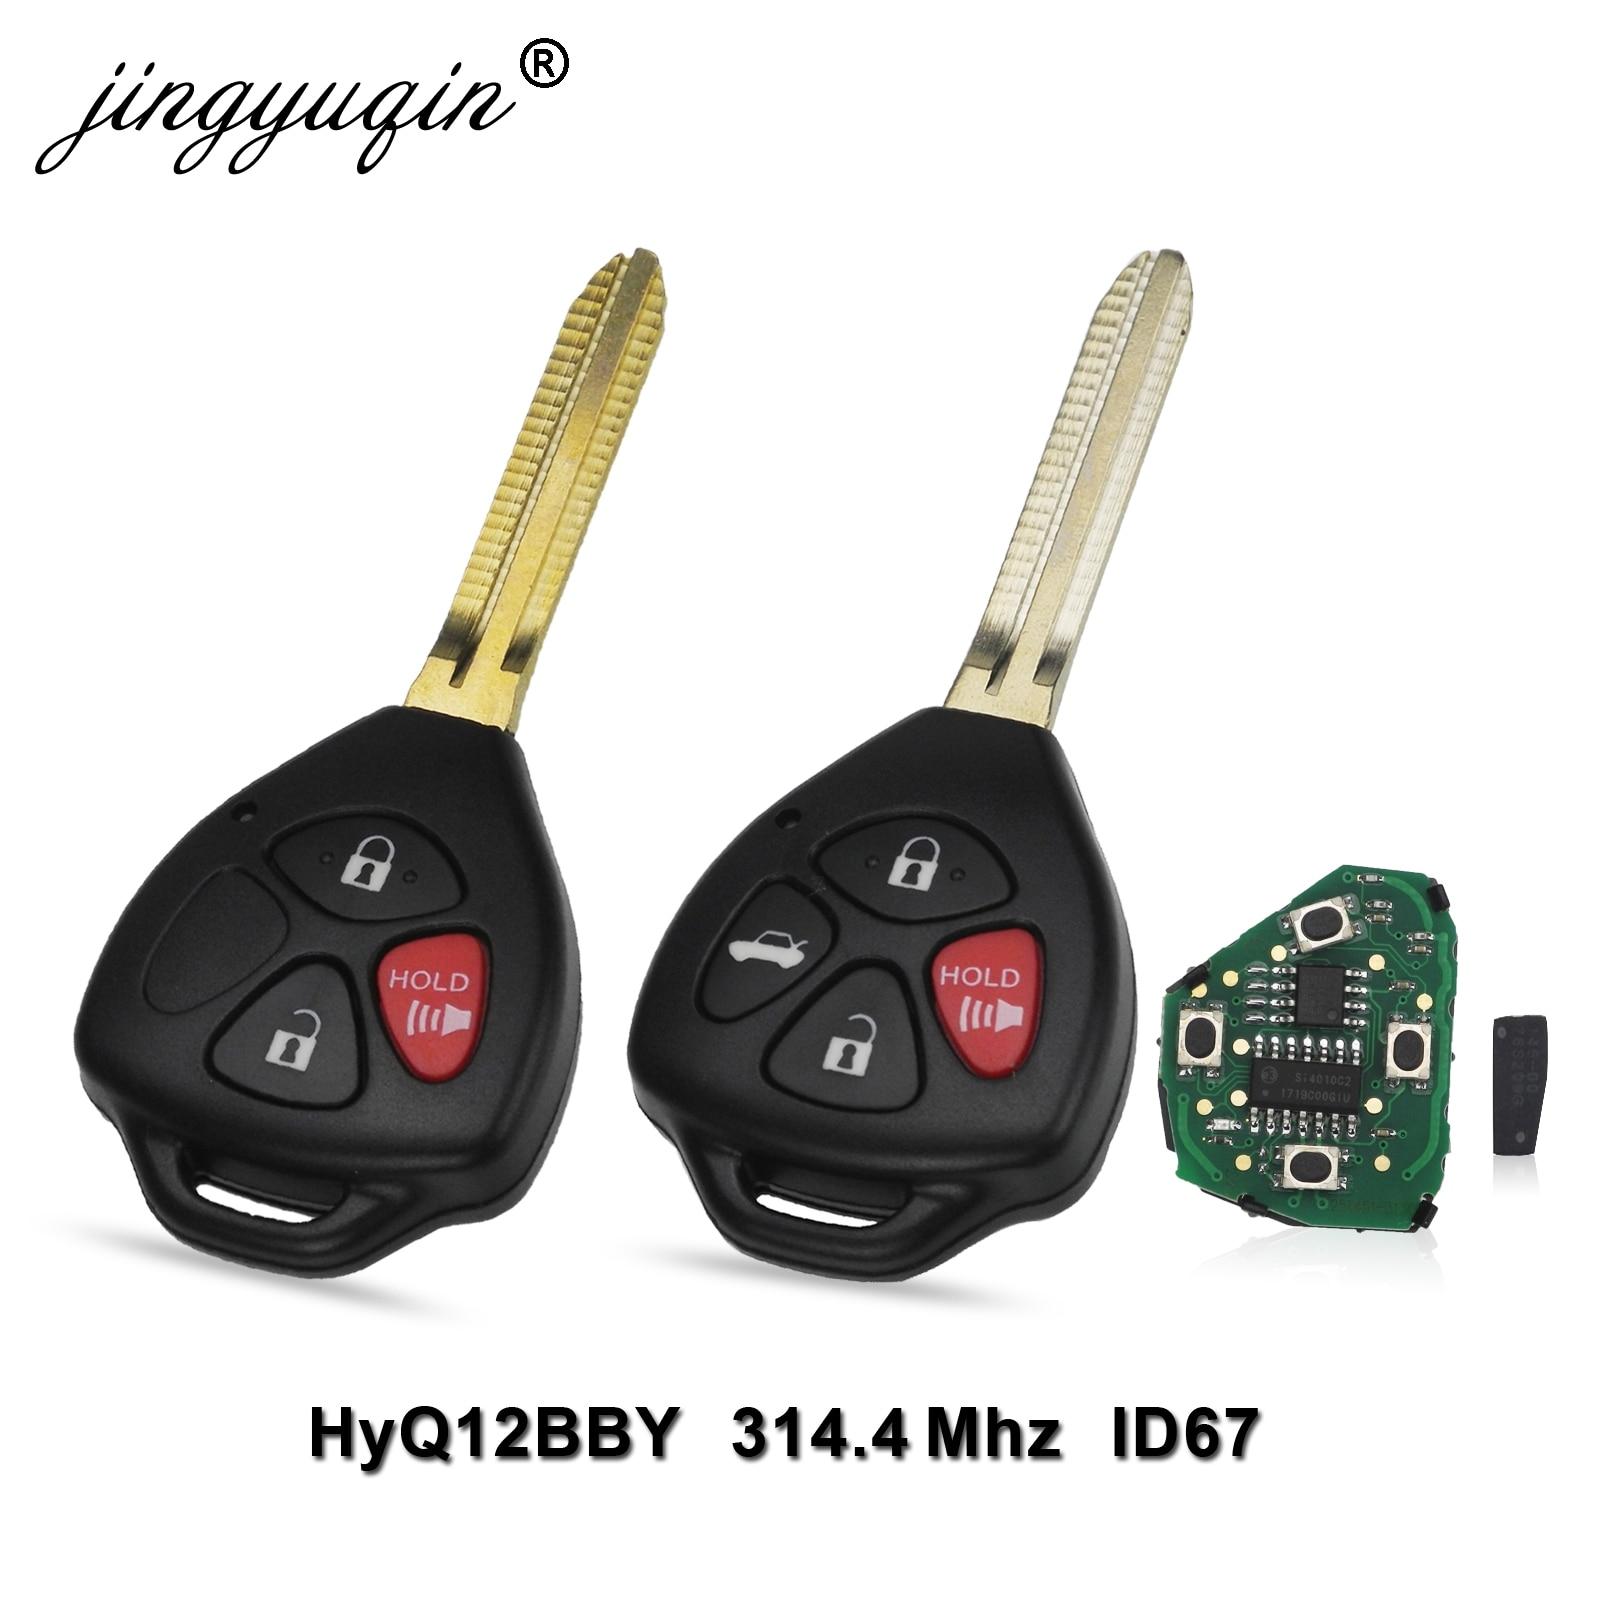 Jingyuqin HyQ12BBY 314,4 МГц ID67 3/4 кнопки дистанционного ключа автомобиля для Toyota Camry Avalon Corolla Matrix RAV4 Yaris Venza tC/xA/xB/xC